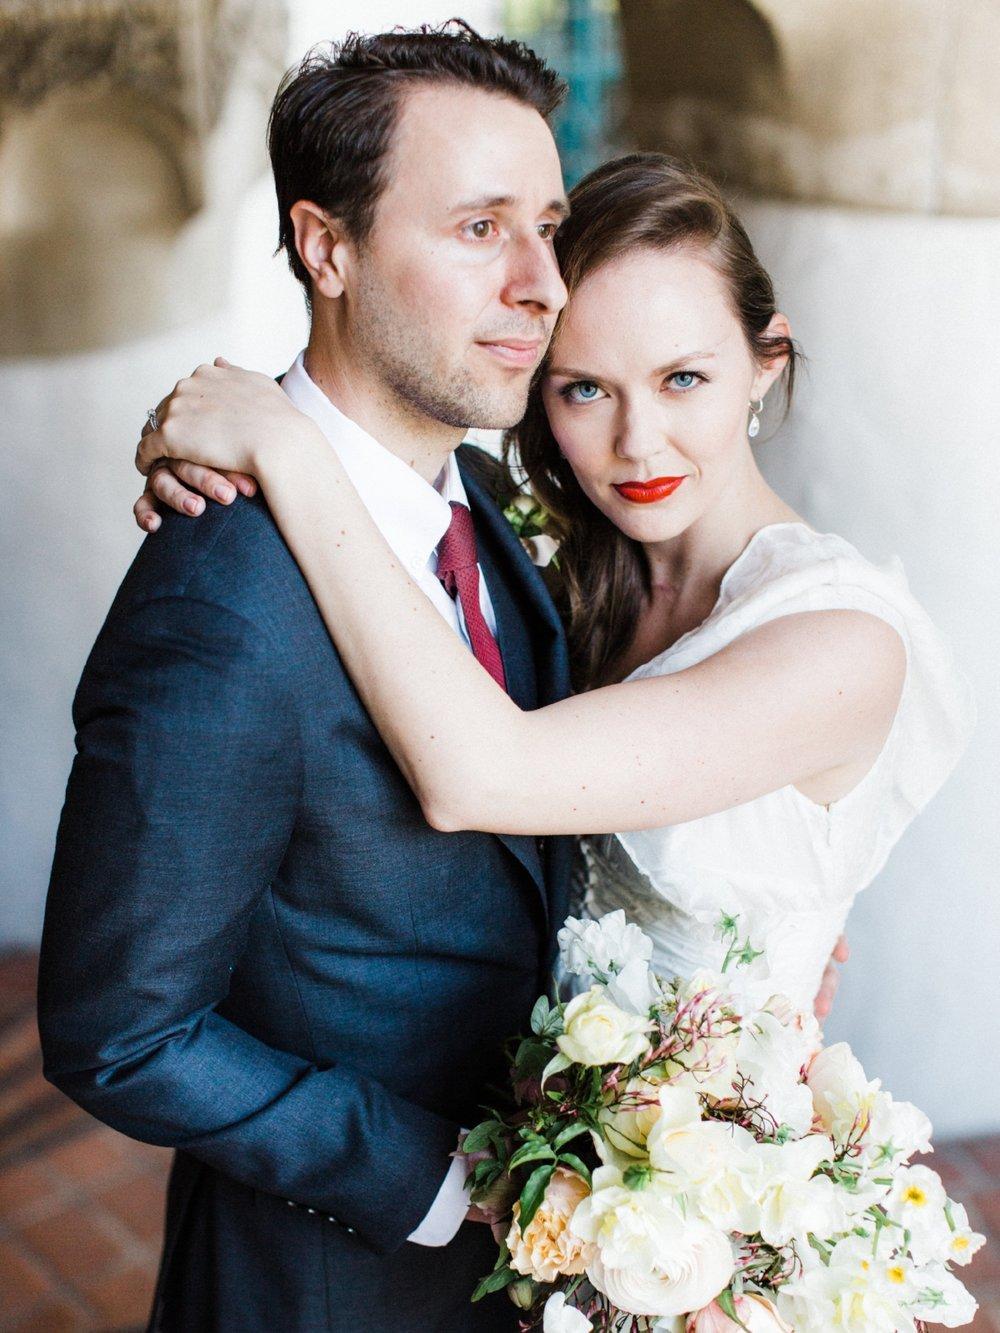 Anna-Delores-Photography-Santa-Barbara-Courthouse-Wedding-Elopement-Lisa-Brian-April-2017-9385.jpg